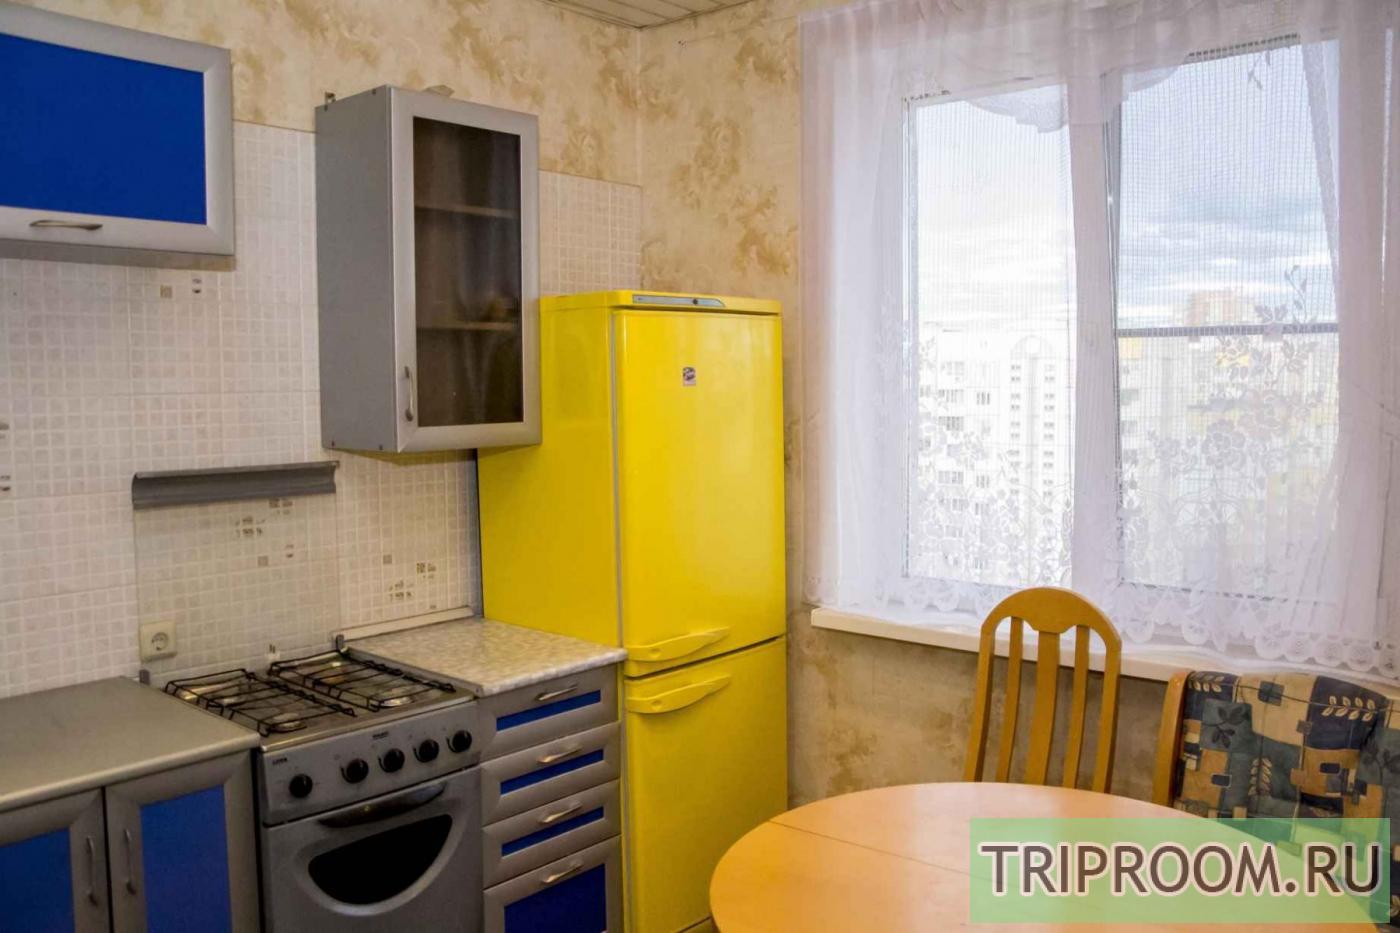 1-комнатная квартира посуточно (вариант № 21406), ул. Стаханова улица, фото № 4